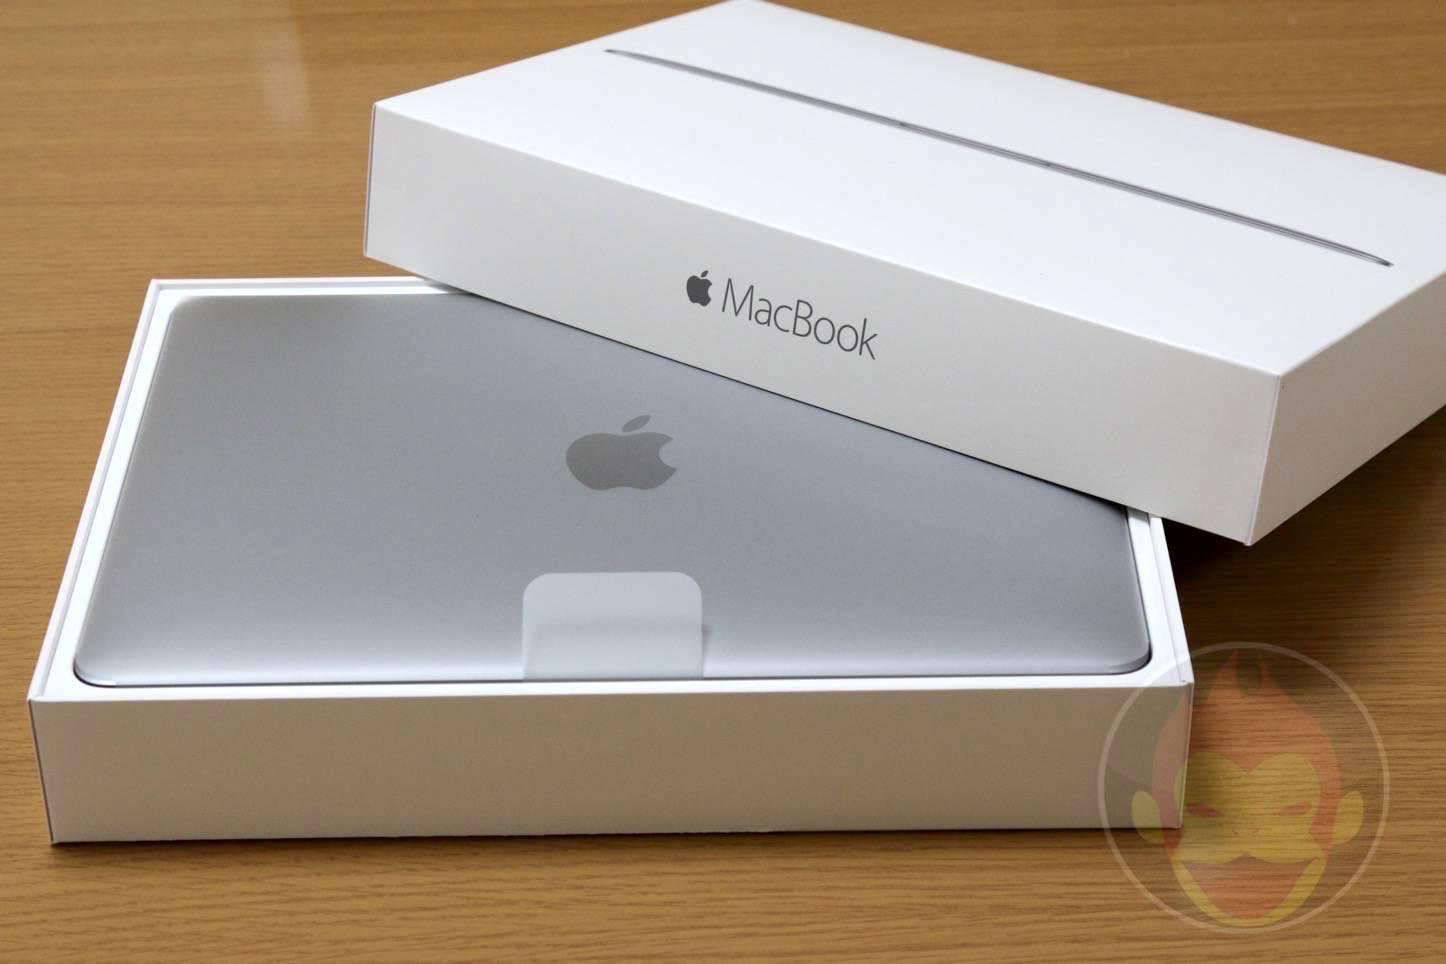 12inch-The-New-MacBook-06.JPG